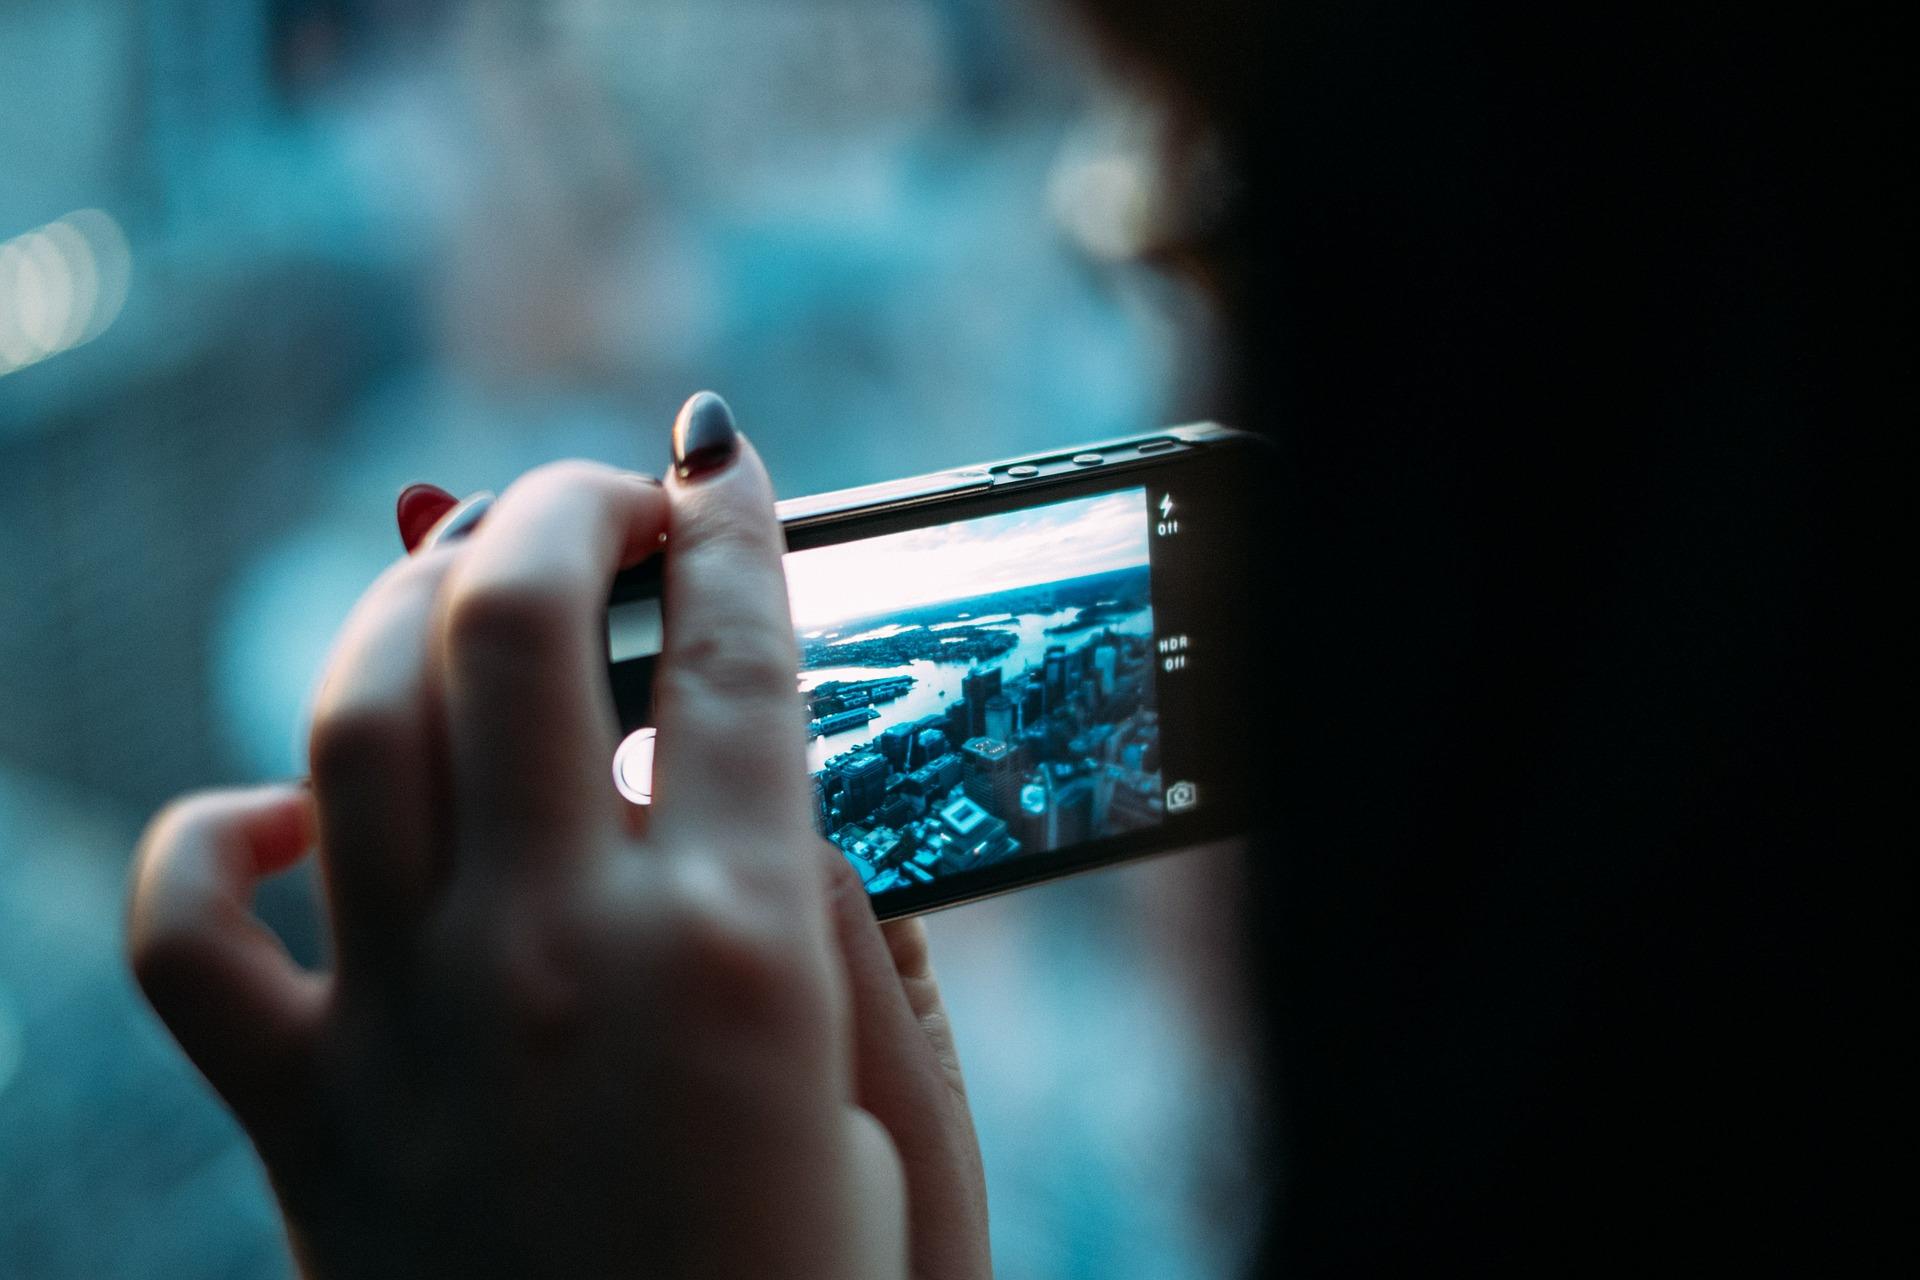 Smartphone's Blue Light. Your Smartphone Screen Emits Blue Light.